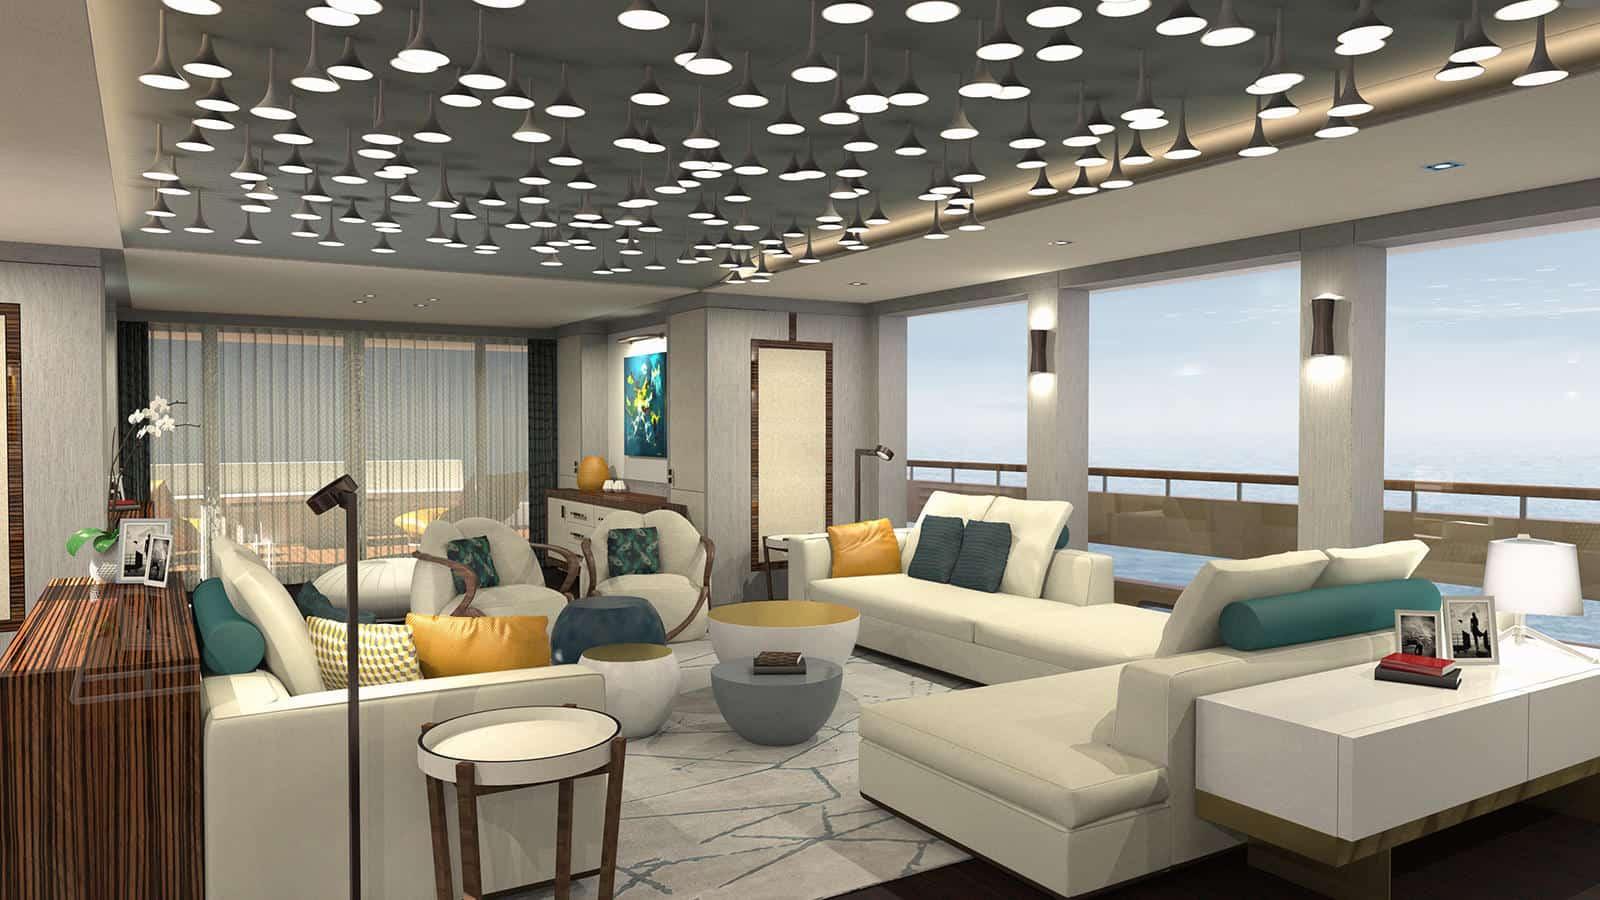 3800 Lounge